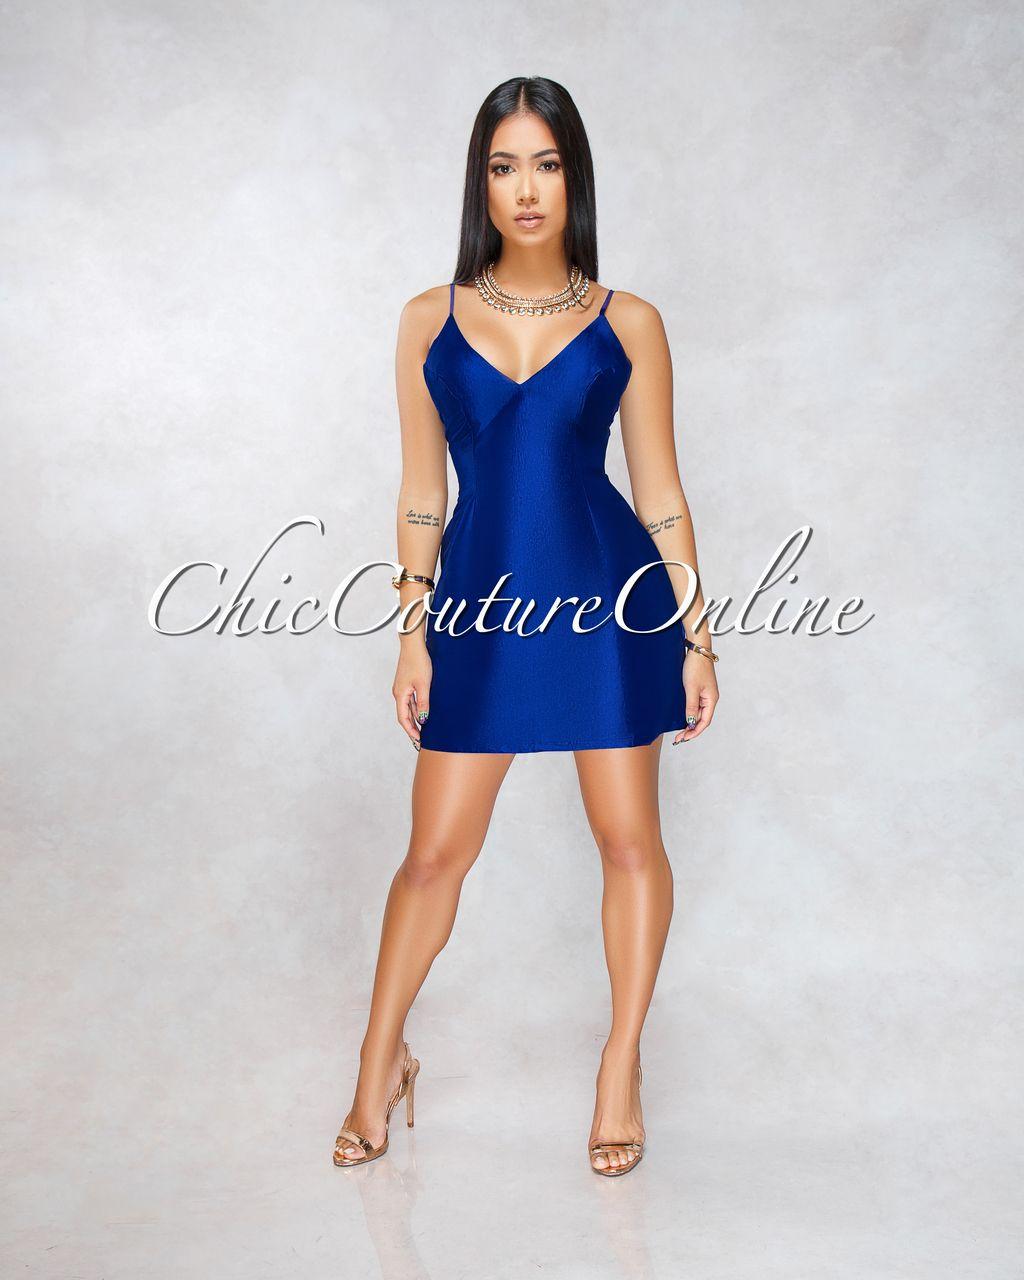 Royal blue n yellow dress  Berry Royal Blue Yellow Silky Pockets Mini Dress  Clothing  Chic